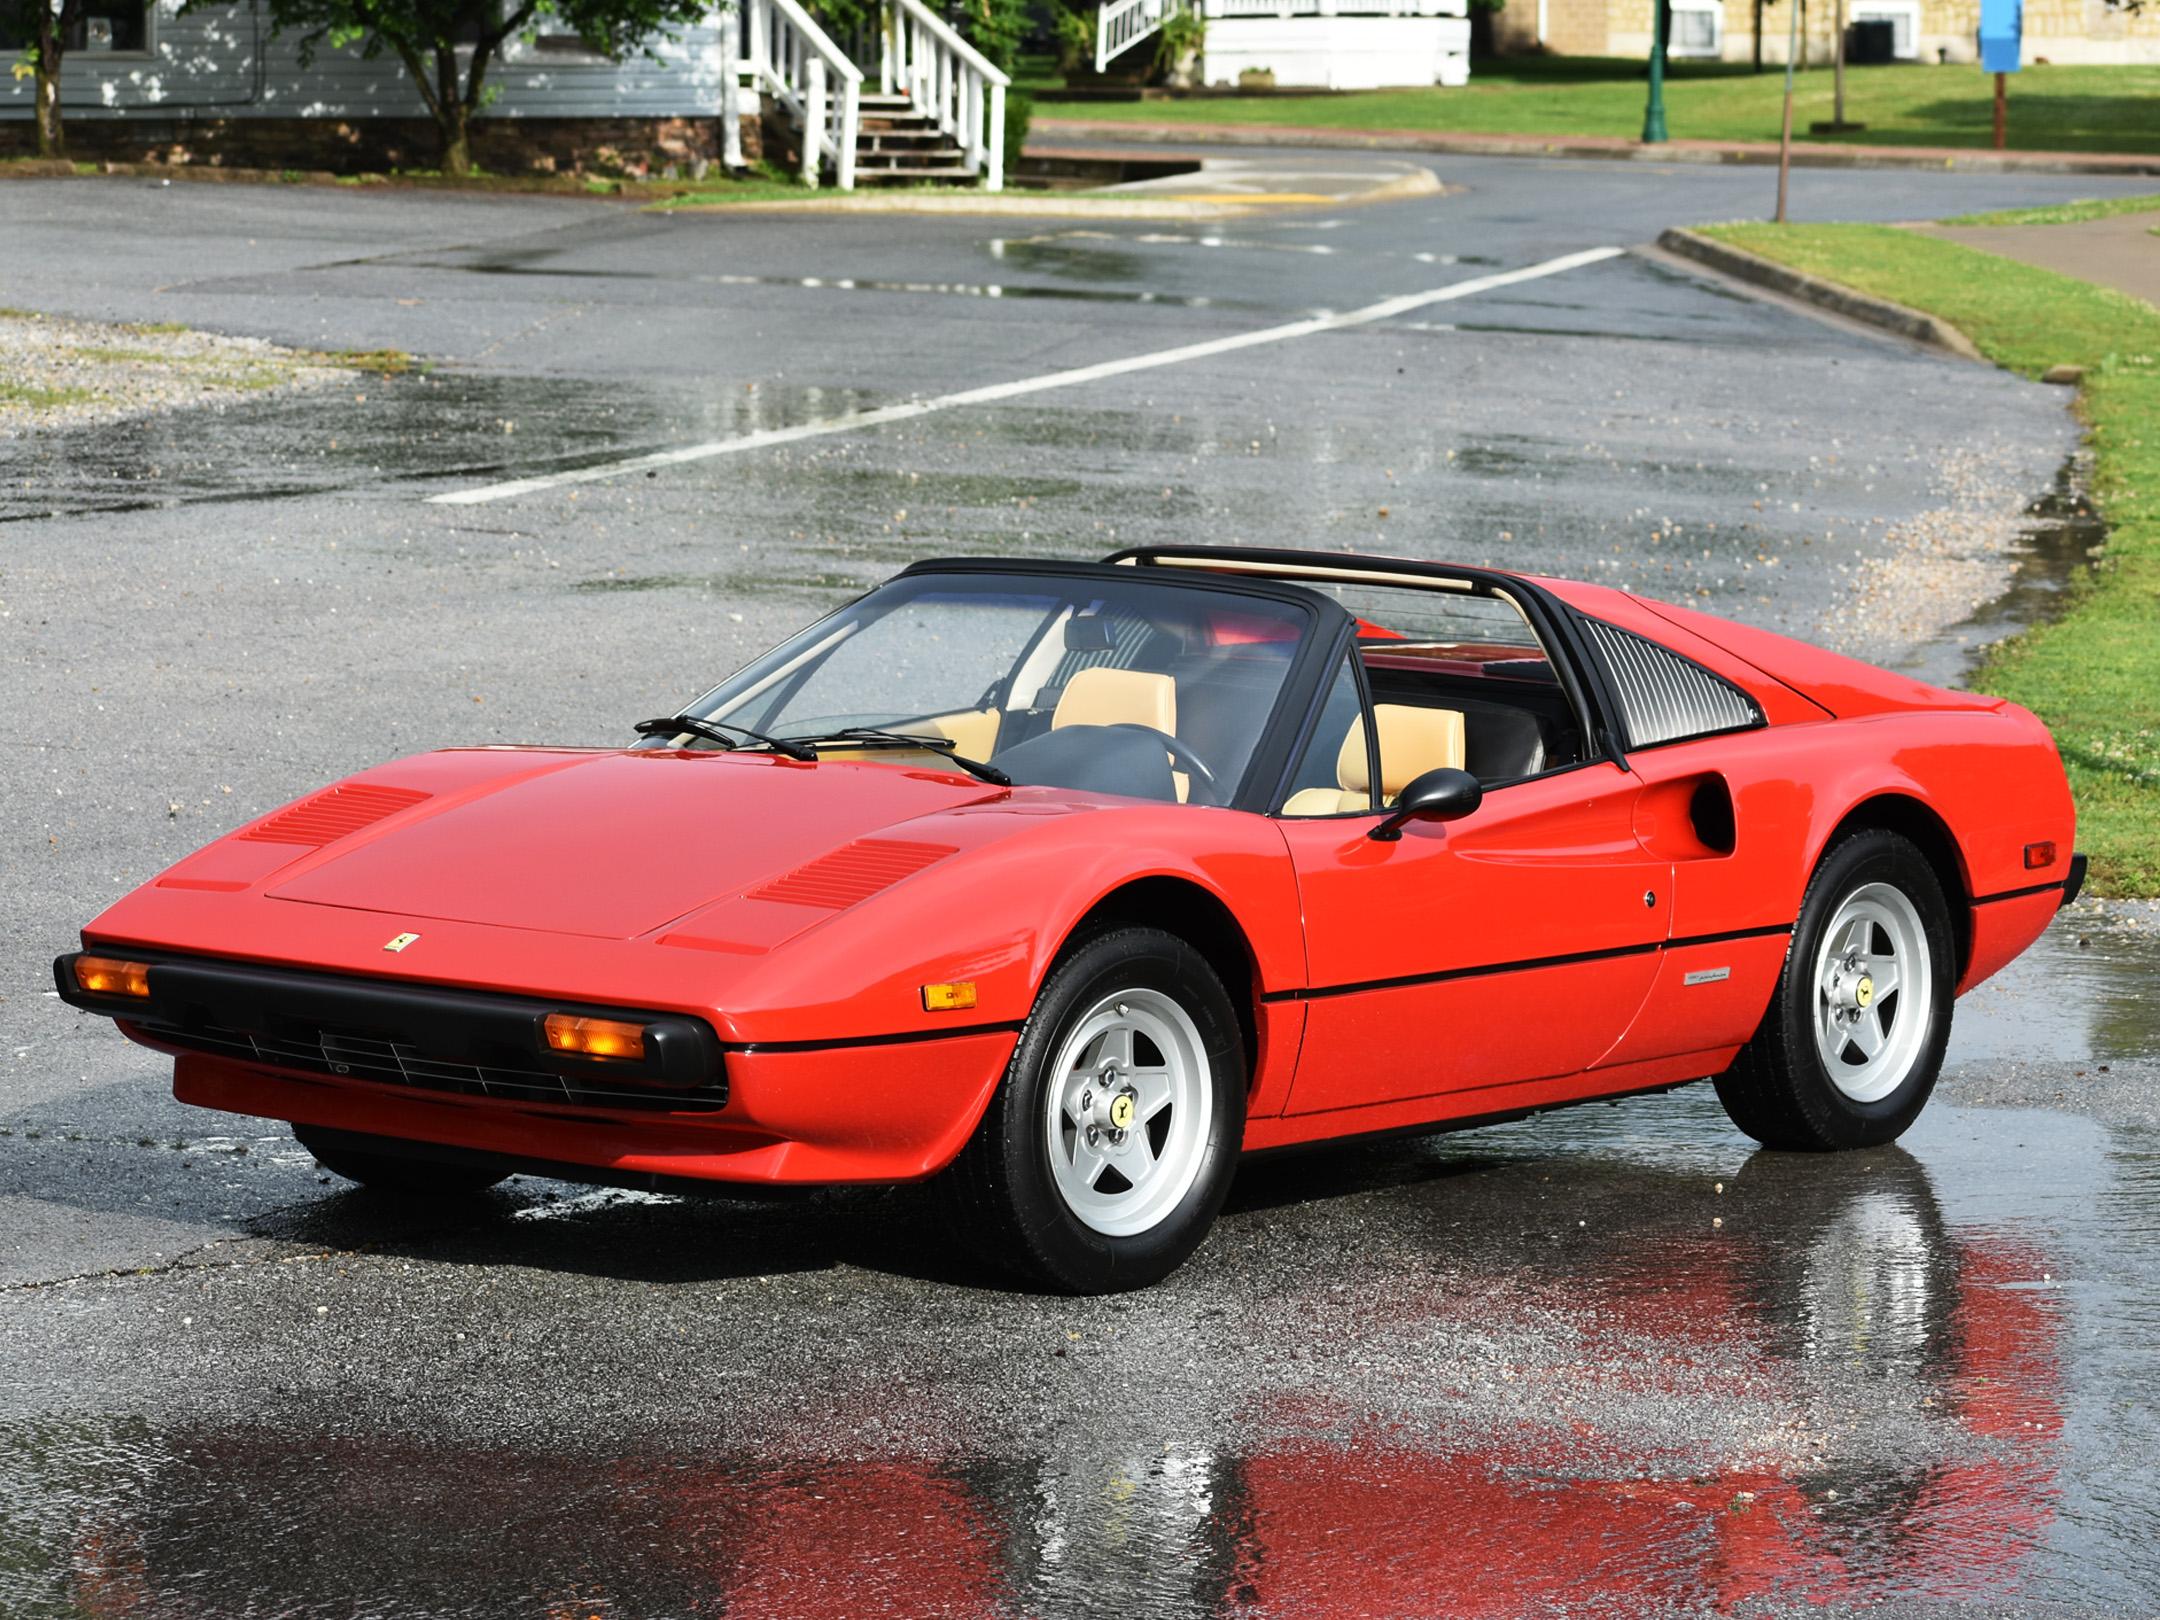 SOLD - YEAR: 1978MAKE: FerrariMODEL: 308GTSVIN: 25693EXTERIOR: RedINTERIOR: TanODOMETER: 31,780